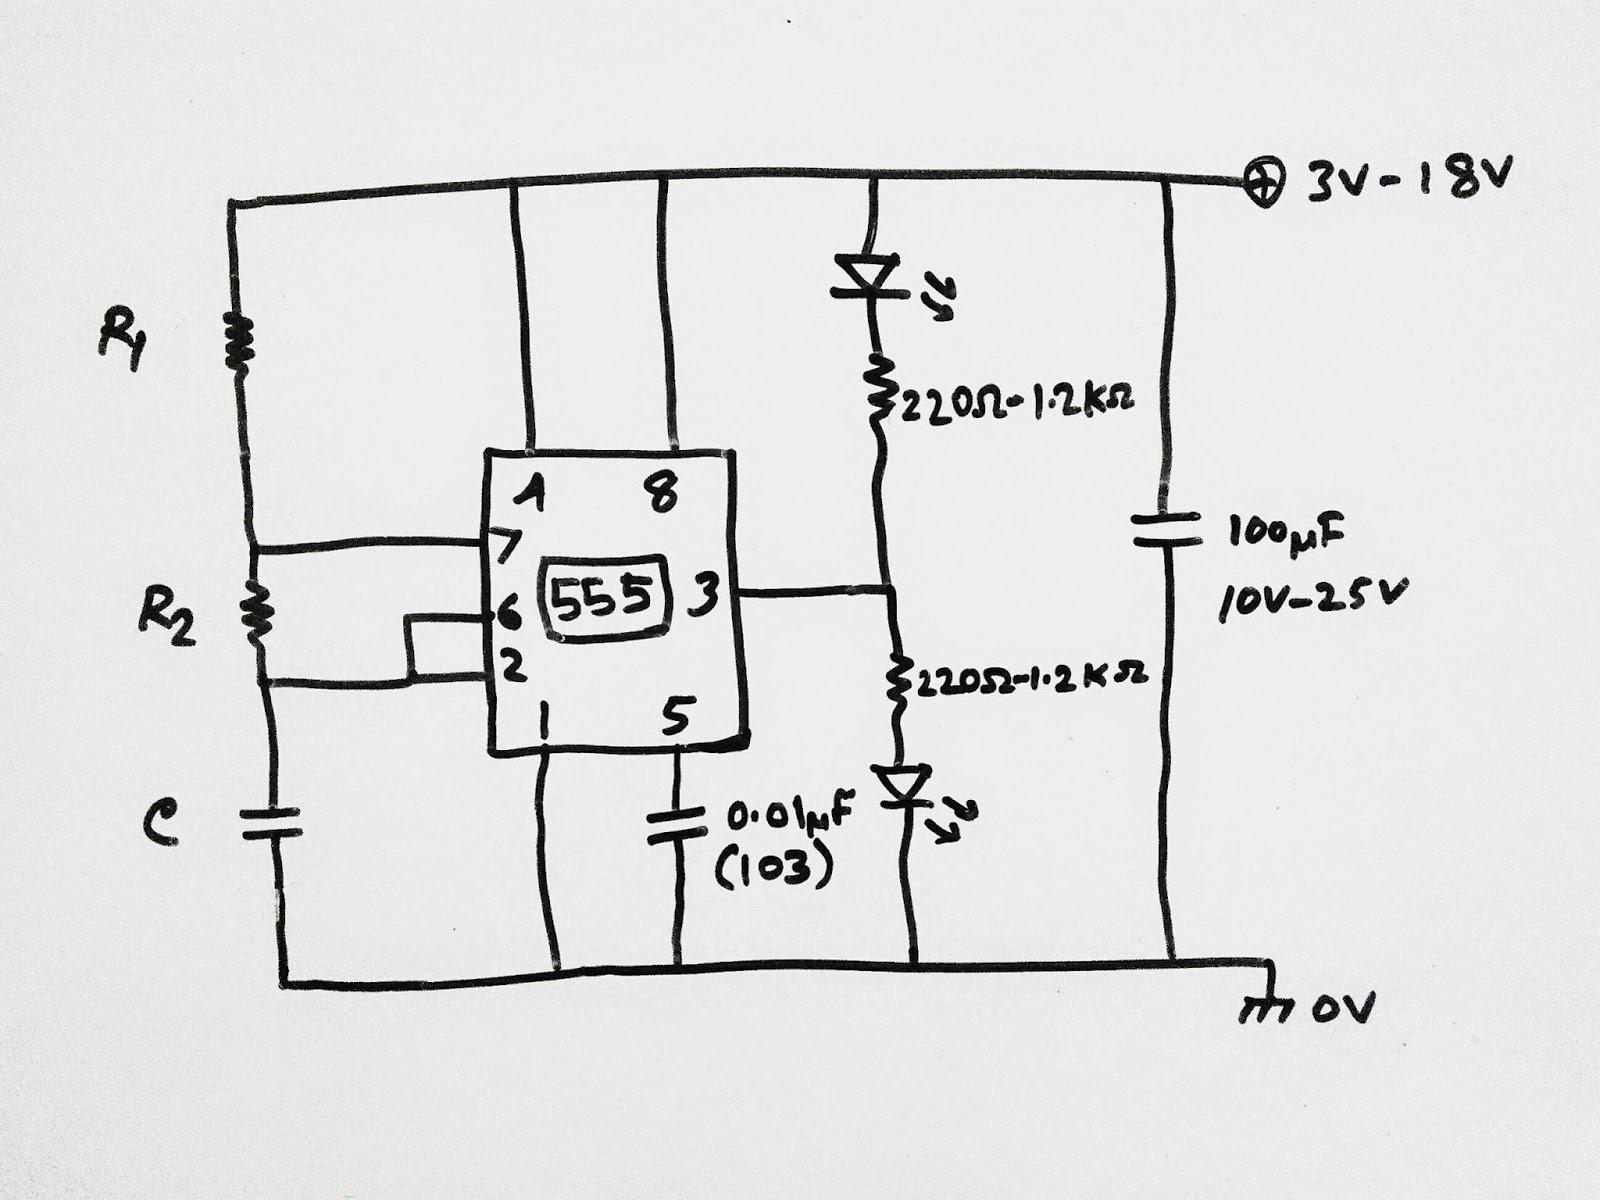 2 pin led flasher relay wiring diagram 1987 yamaha banshee scavenger 39s blog using 555 timer ic hobby